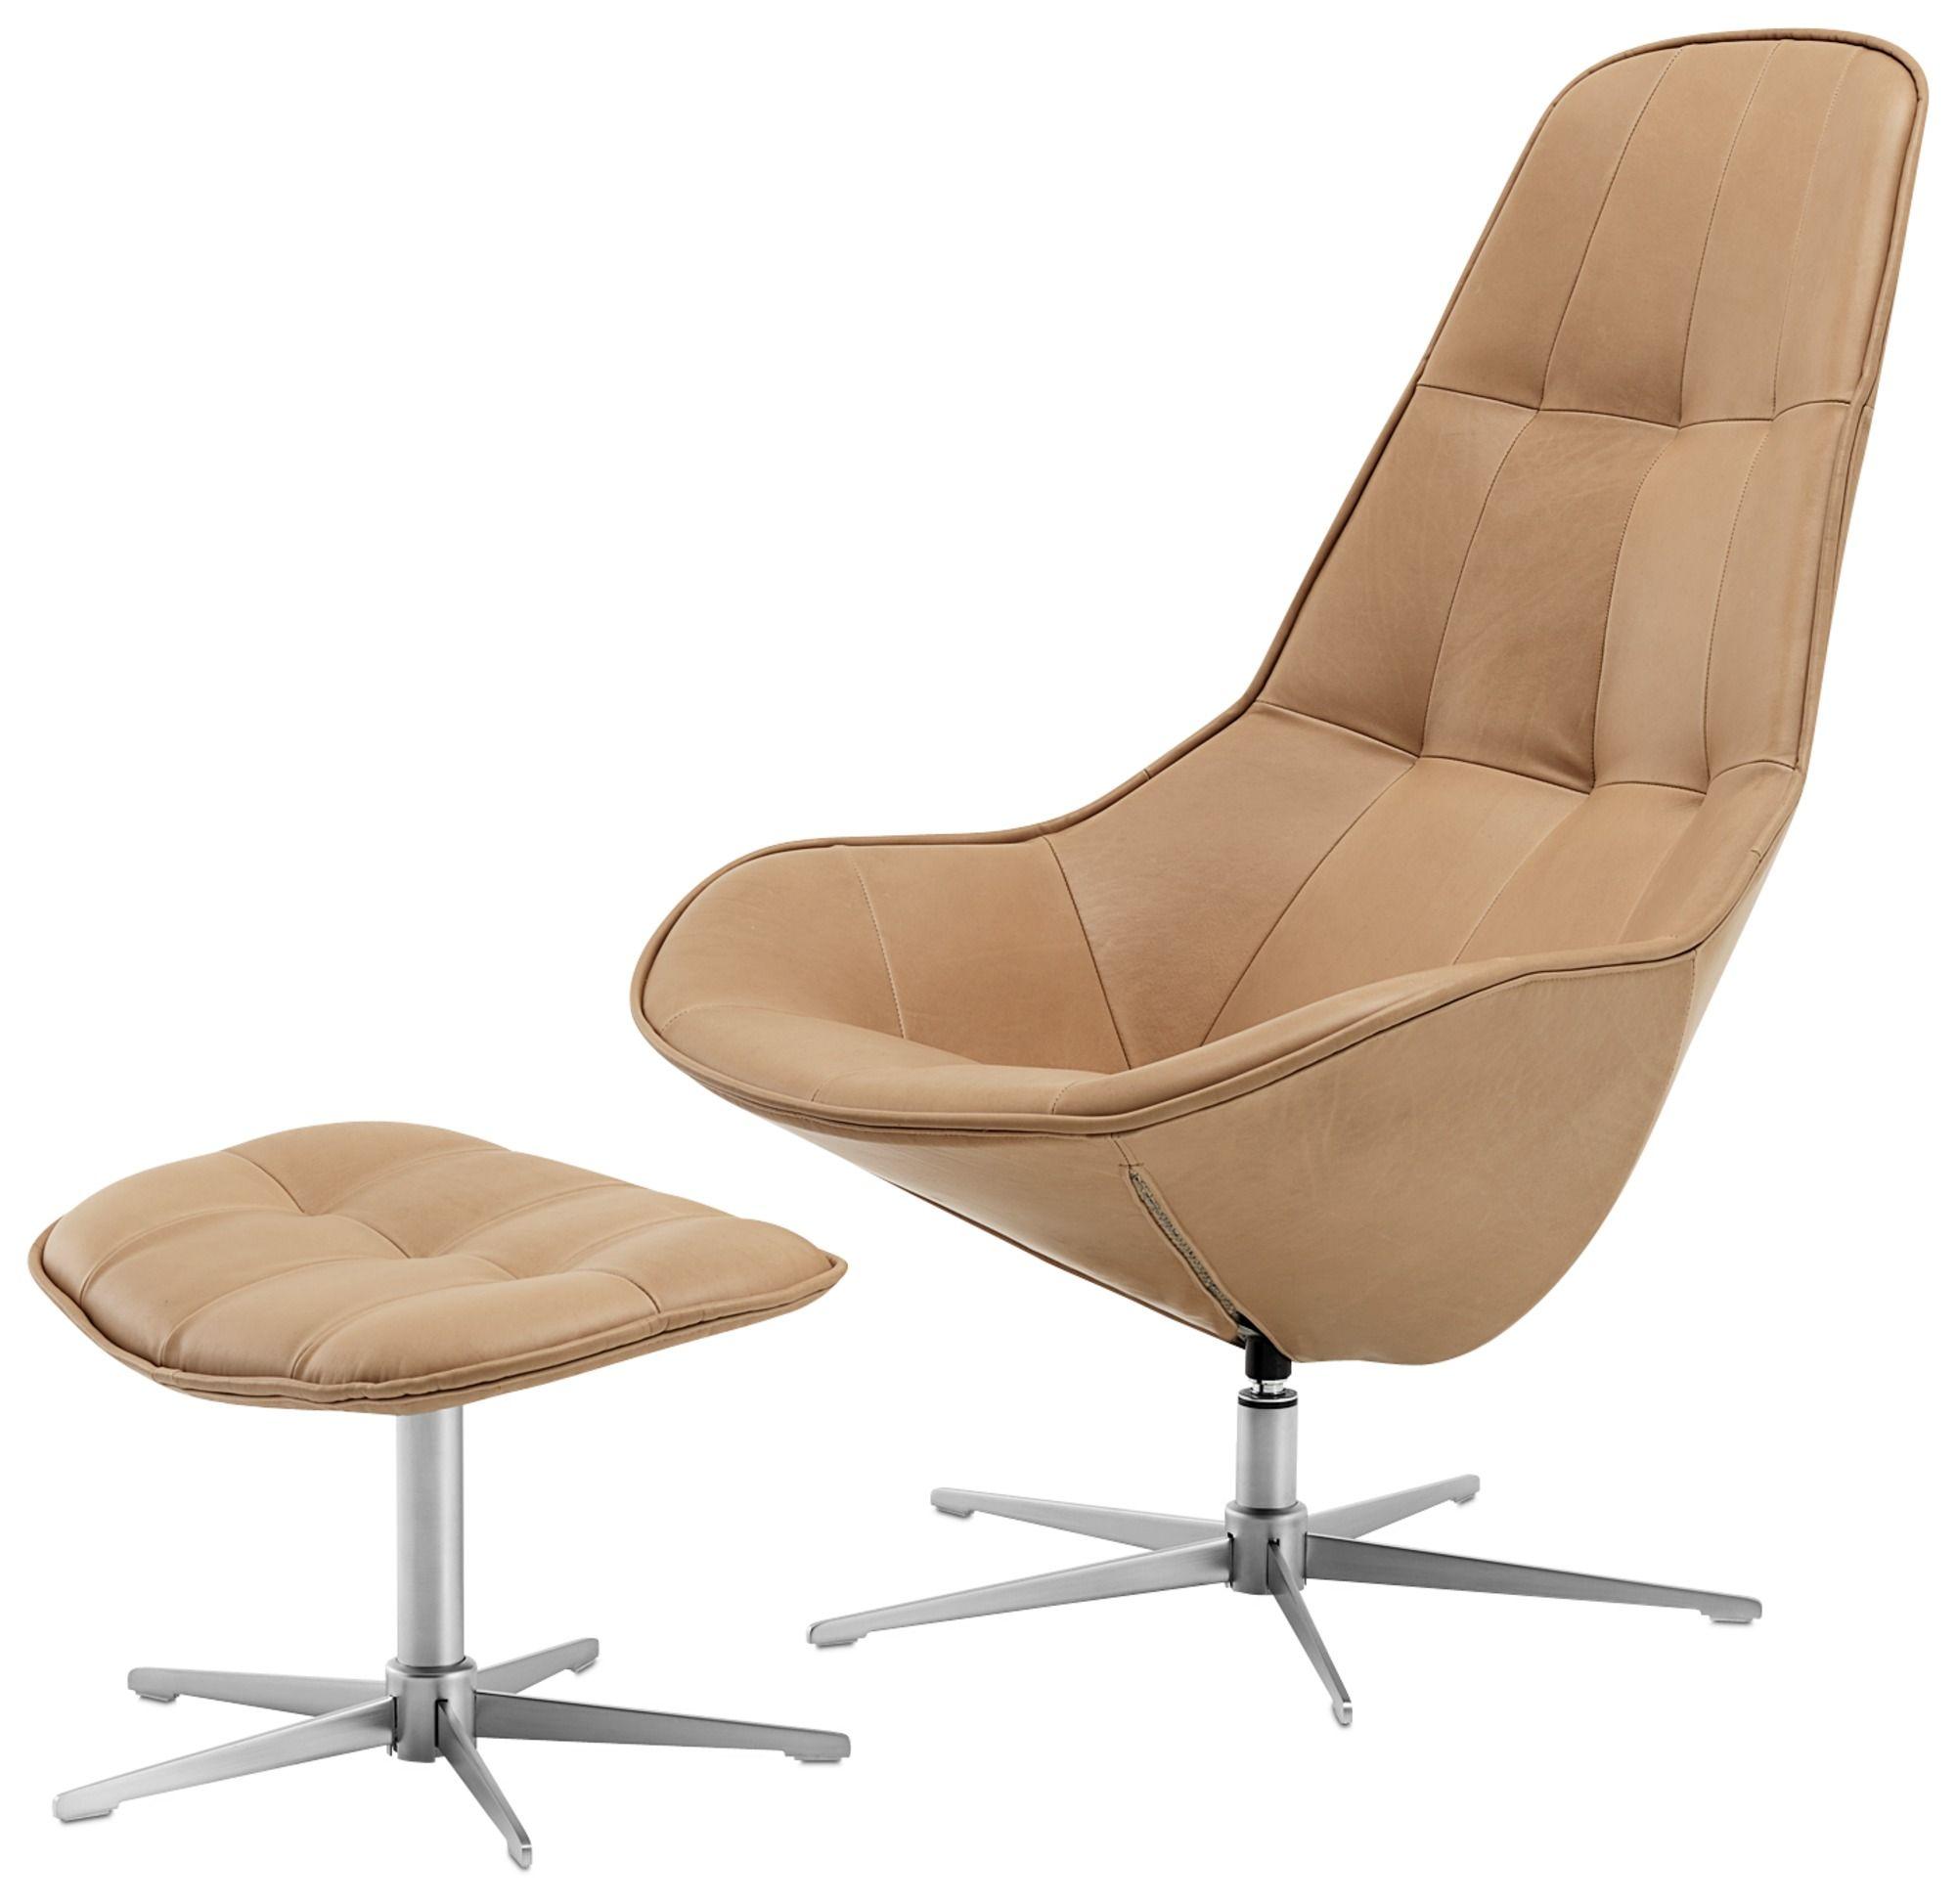 Modern Designer Armchairs Leather Lounge Chairs Boconcept Furniture Sydney Australia Wayfair Living Room Chairs Boconcept Modern Armchair